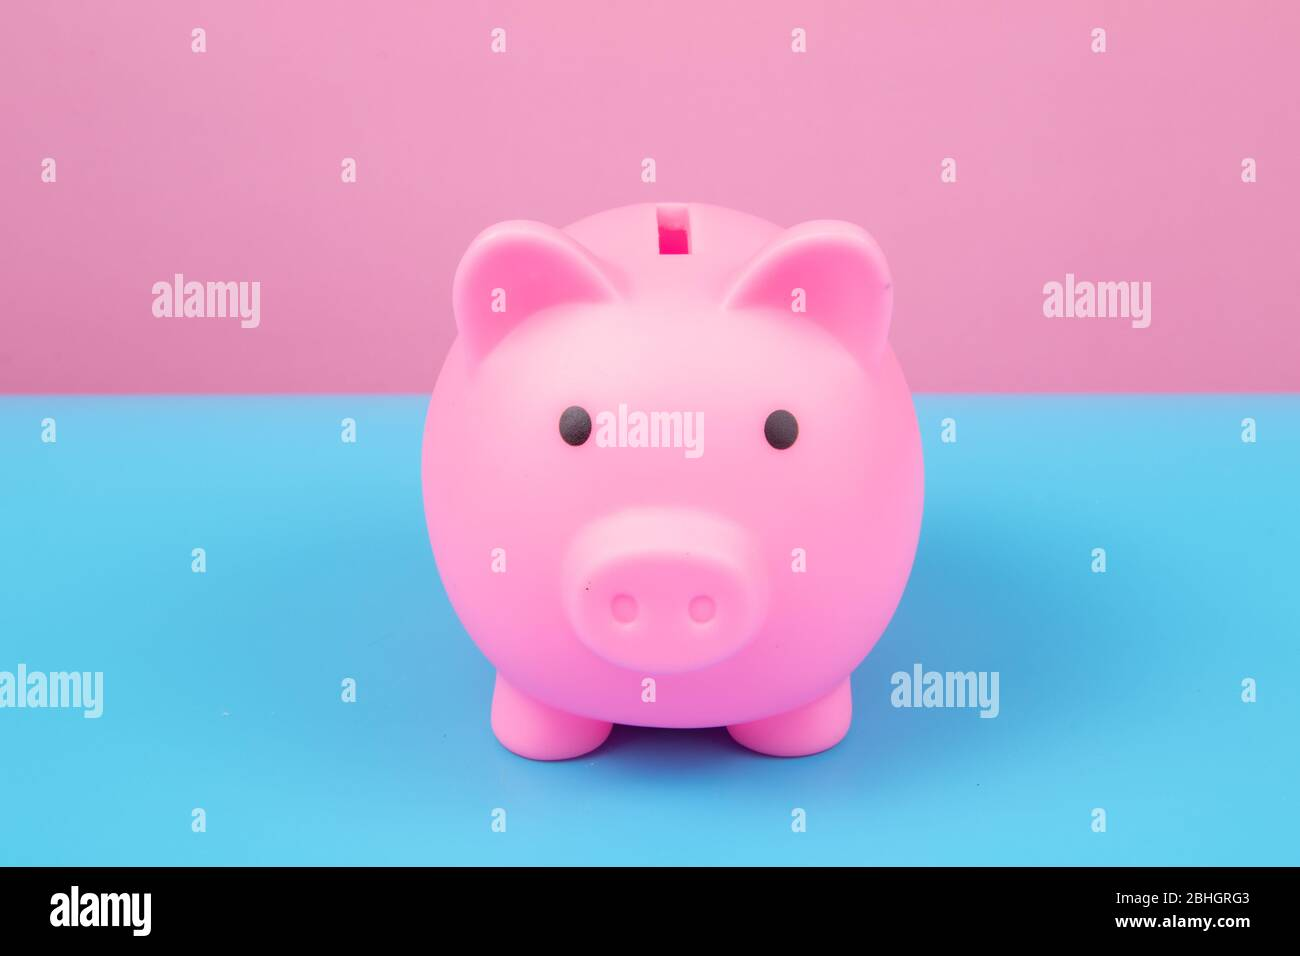 Pink Piggy banco sobre fondo de armonía. Foto de stock